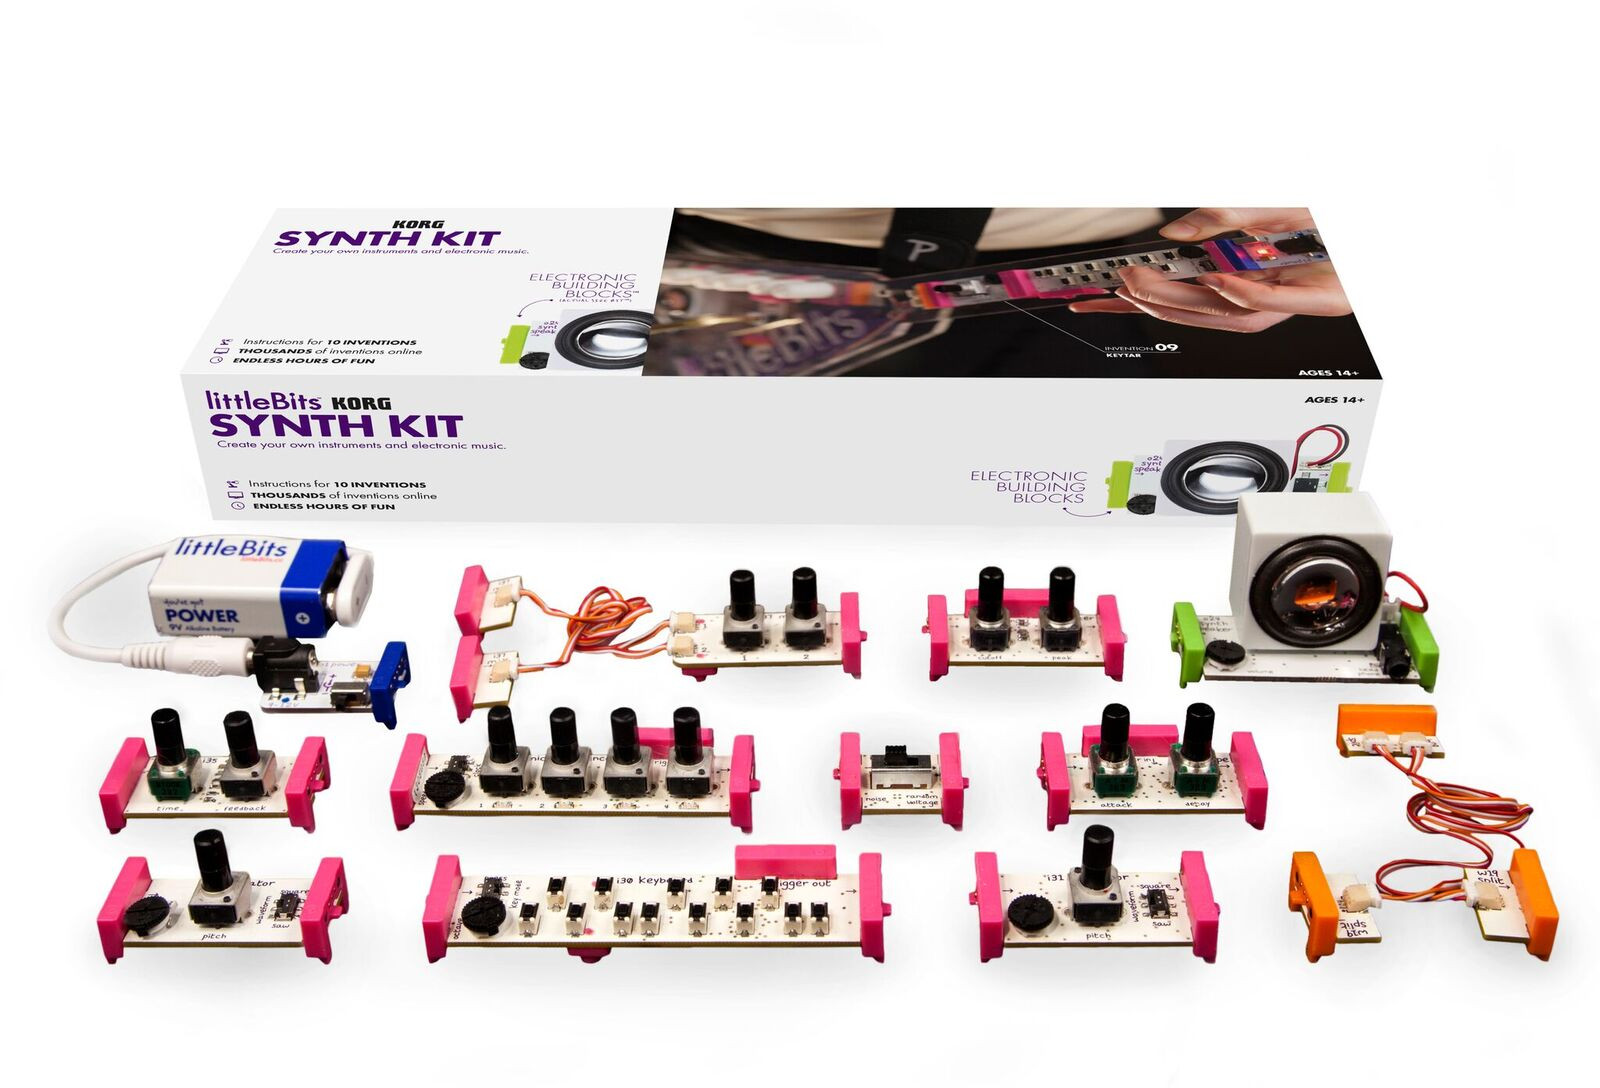 2014 littleBits | Synth Kit